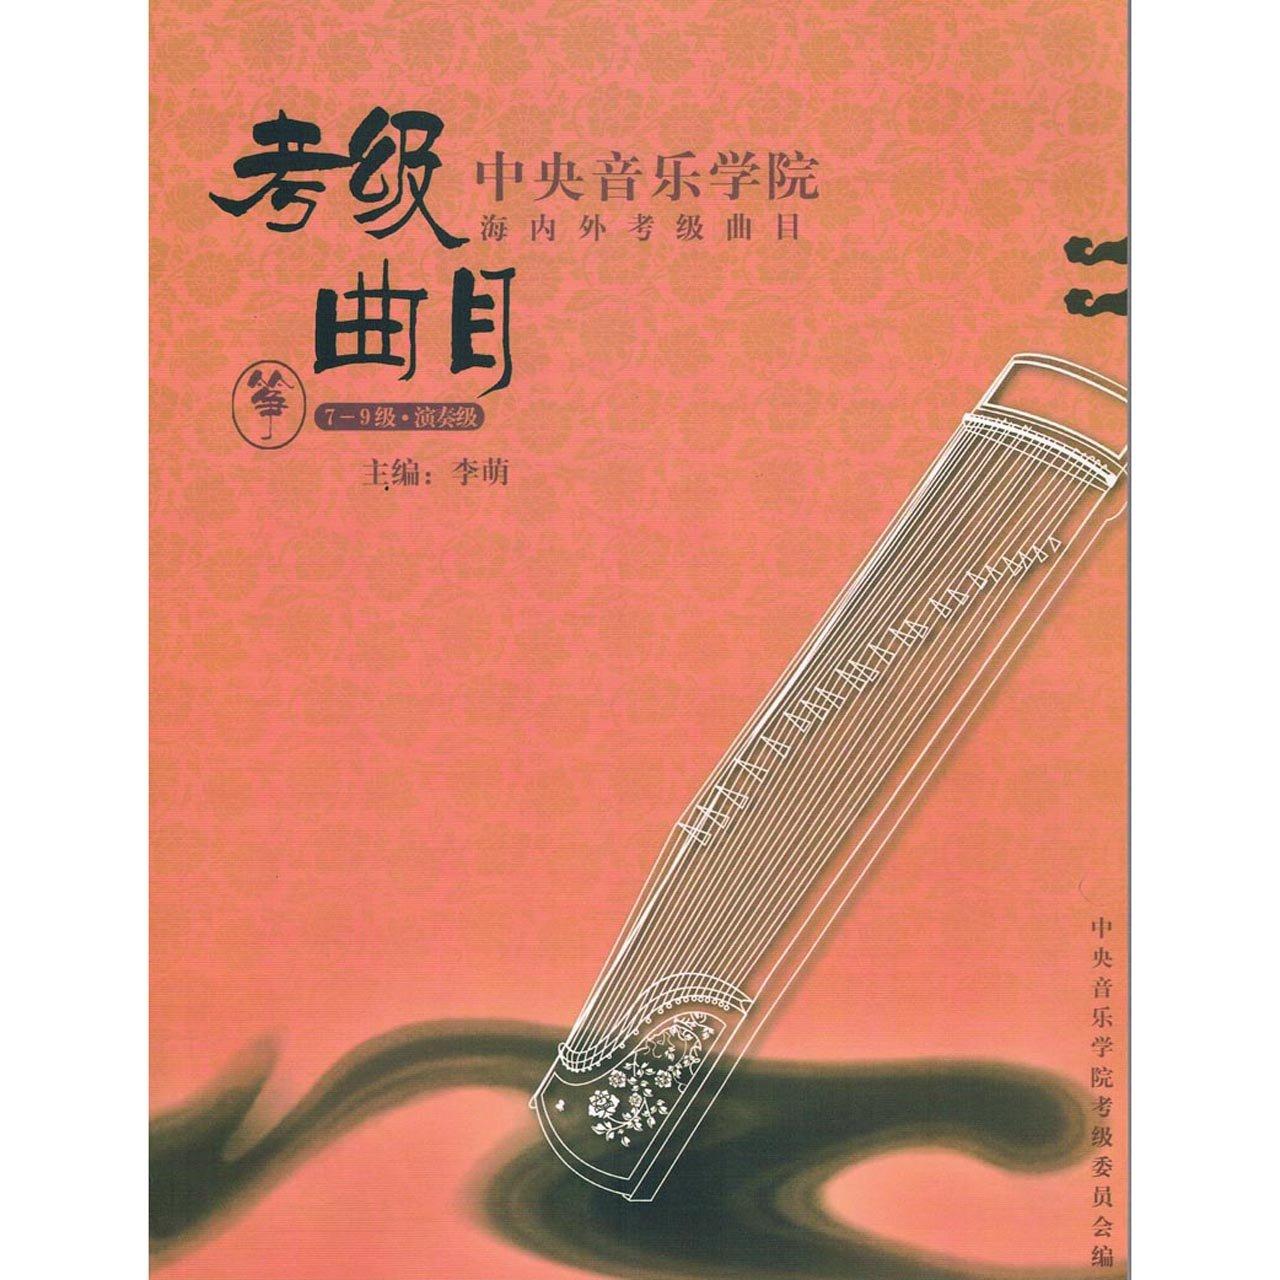 Eason Music Central Conservatory of Music Guzheng Grading Book (Grade 7-Diploma)